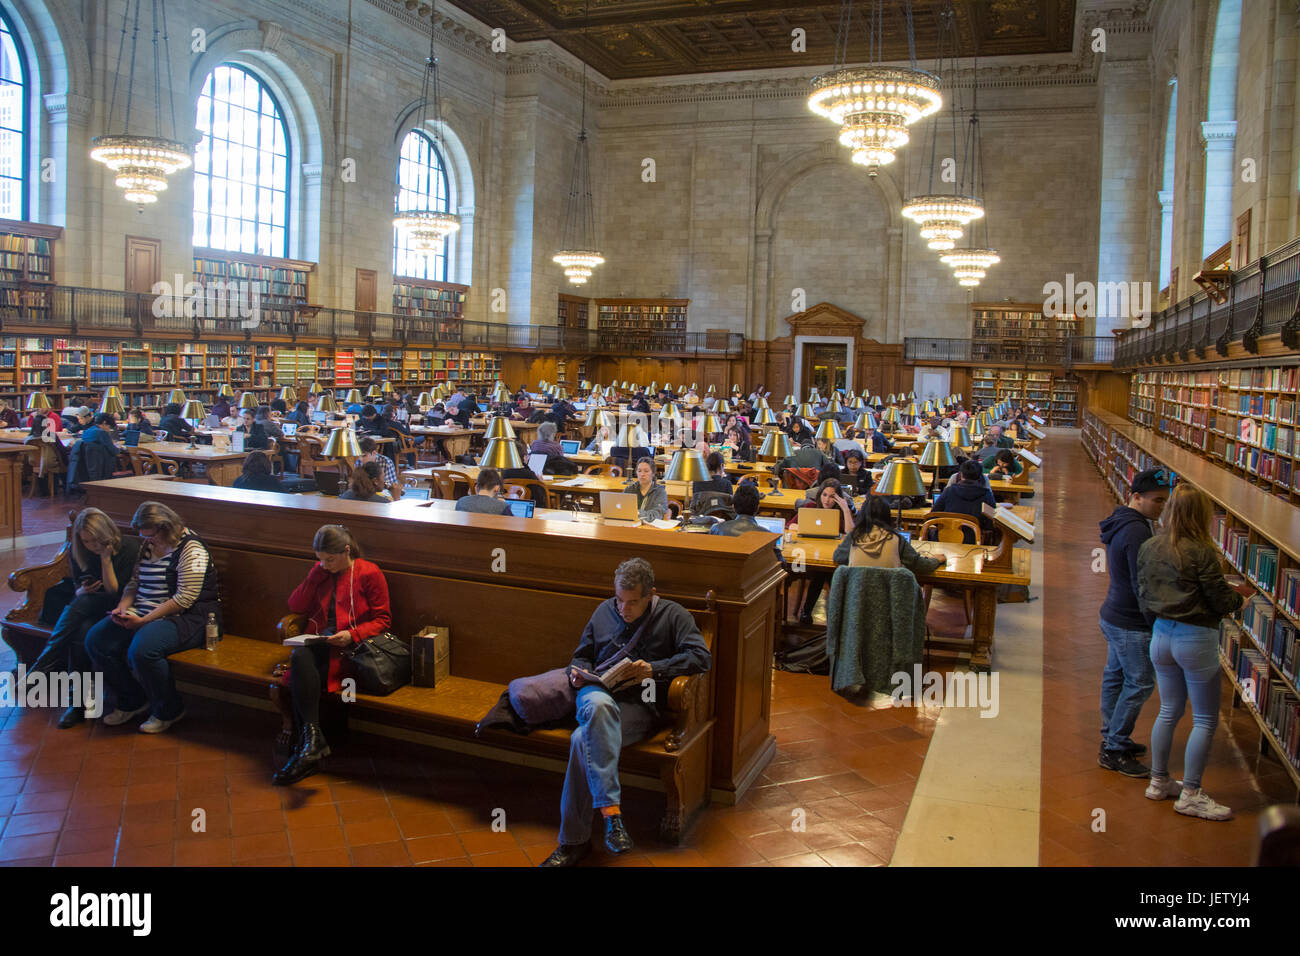 Reading Room, New York Public Library, Stephen A. Schwarzman Building in New York CIty, USA Stockbild